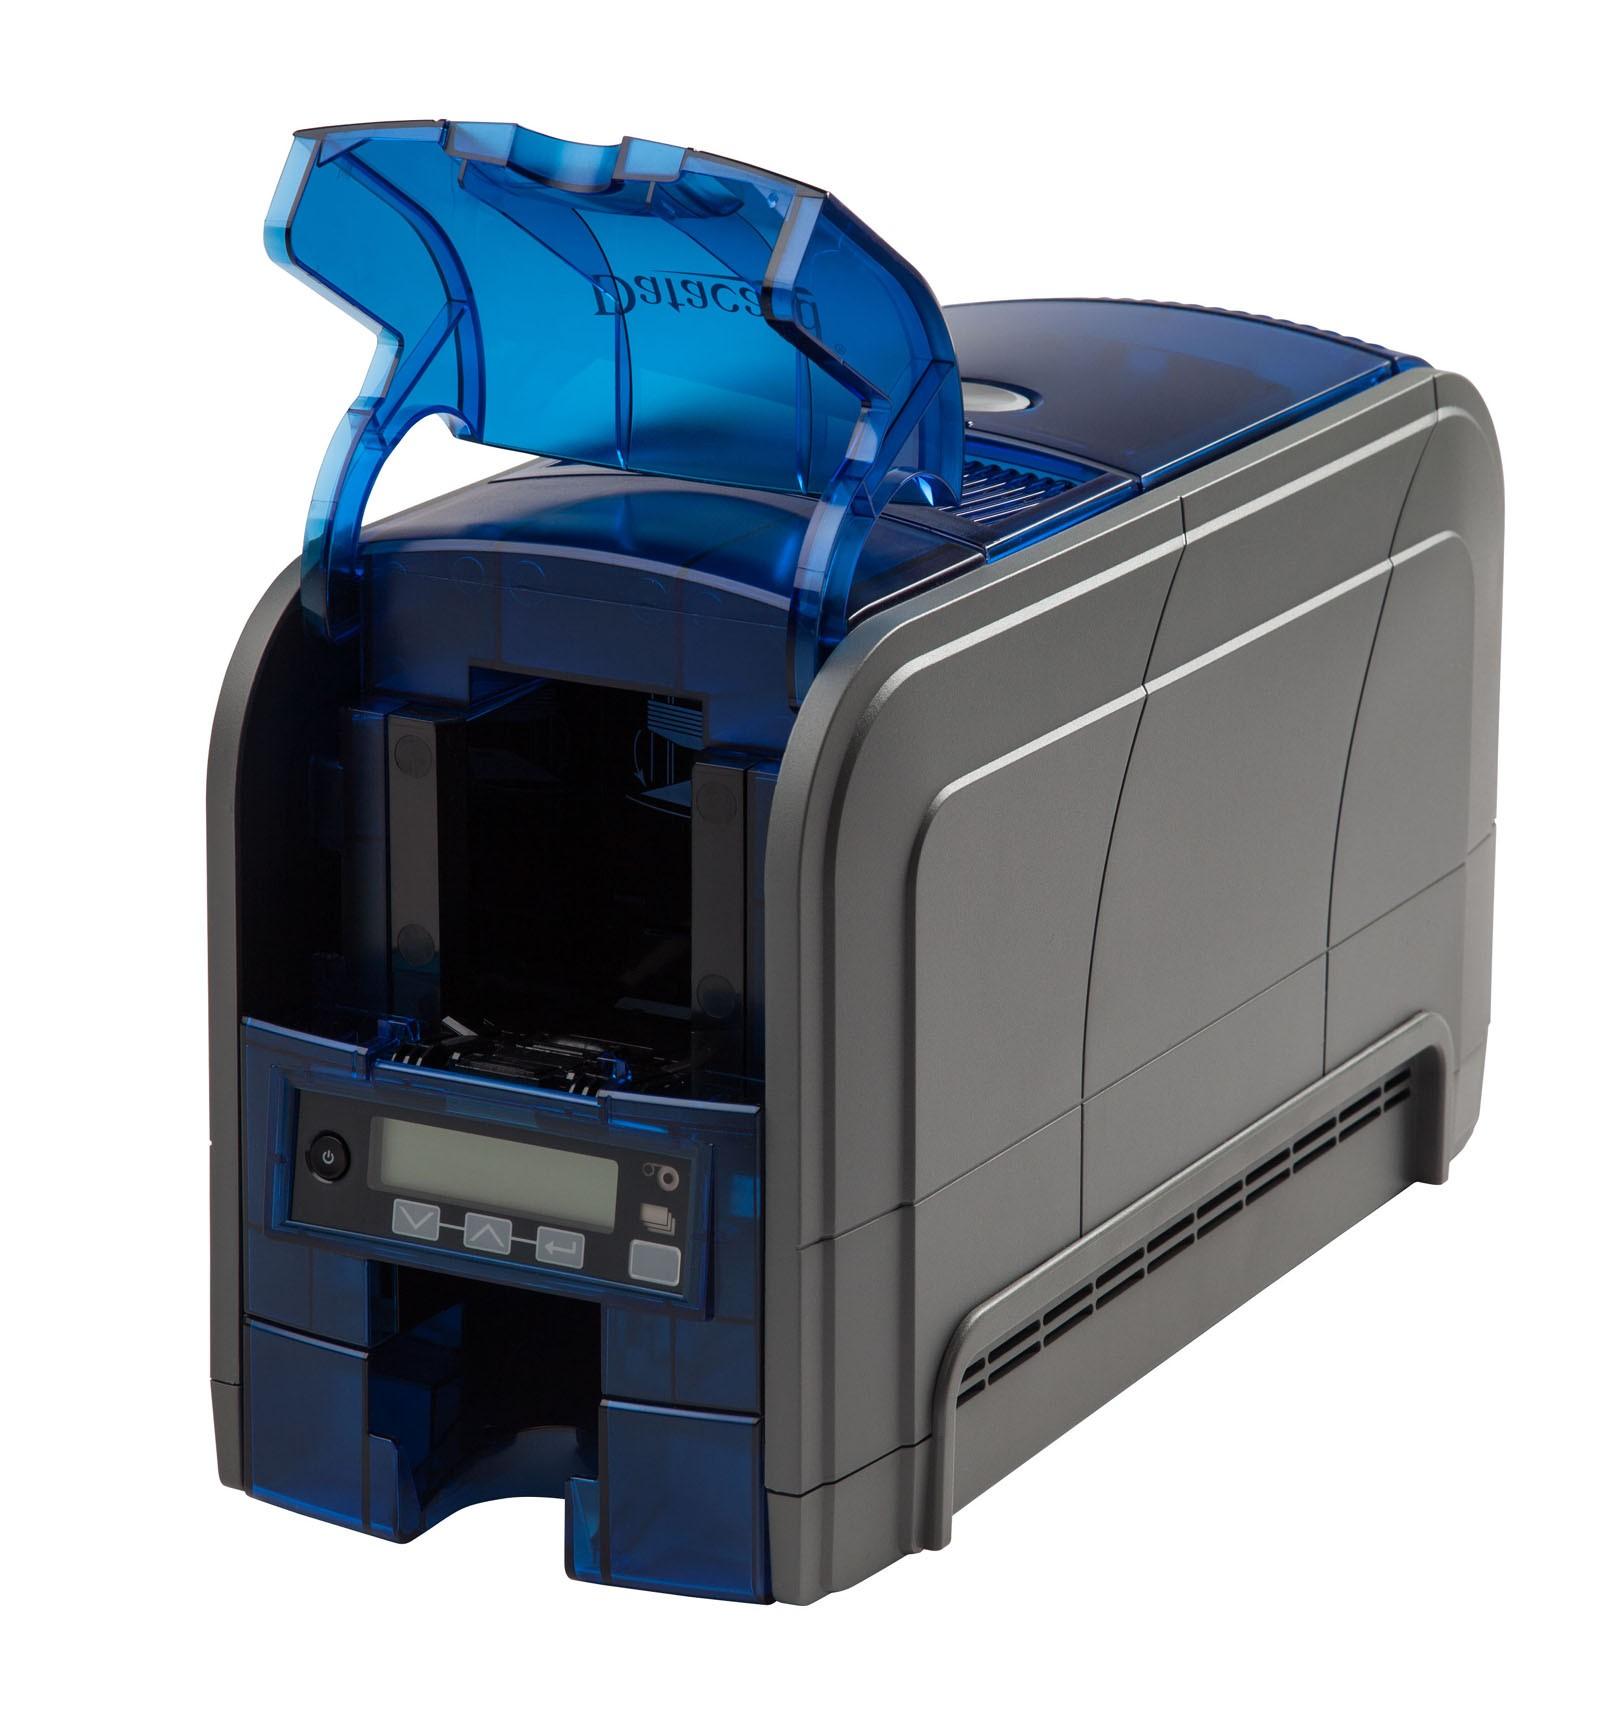 Impressora Datacard SD260